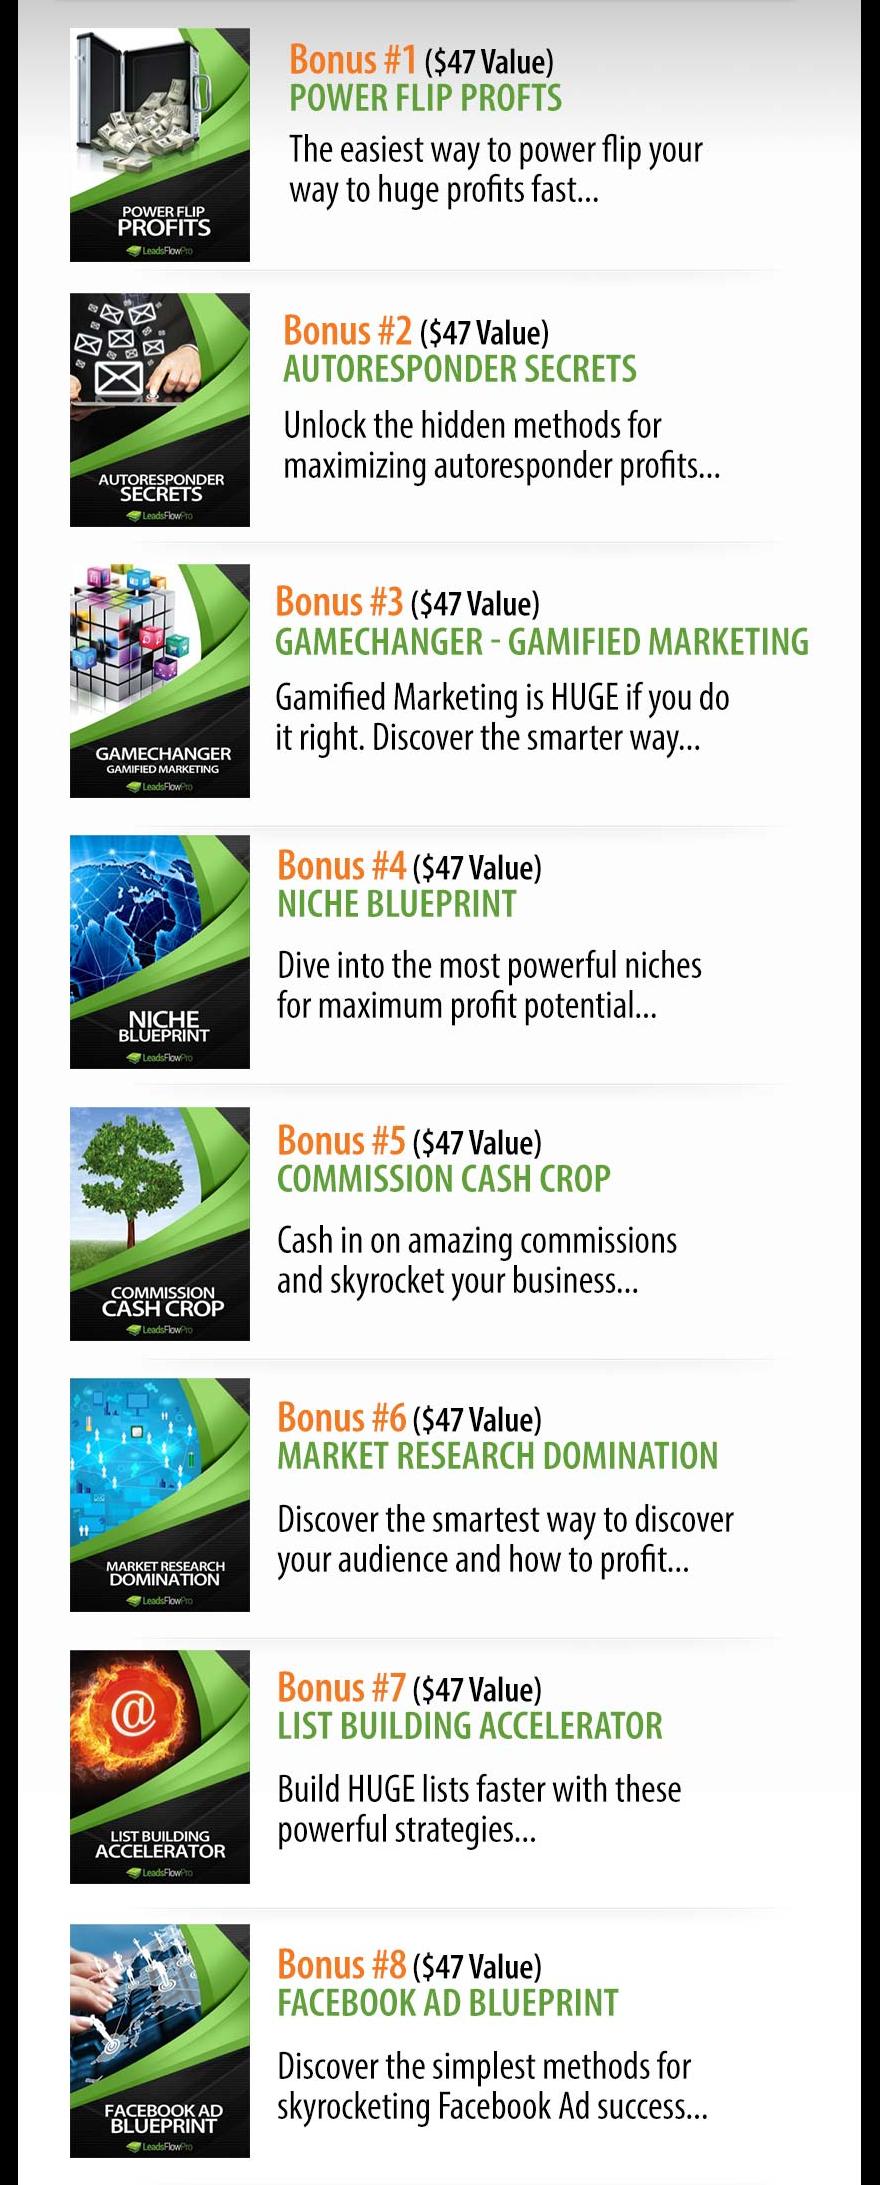 LeadsFlow Pro Bonuses